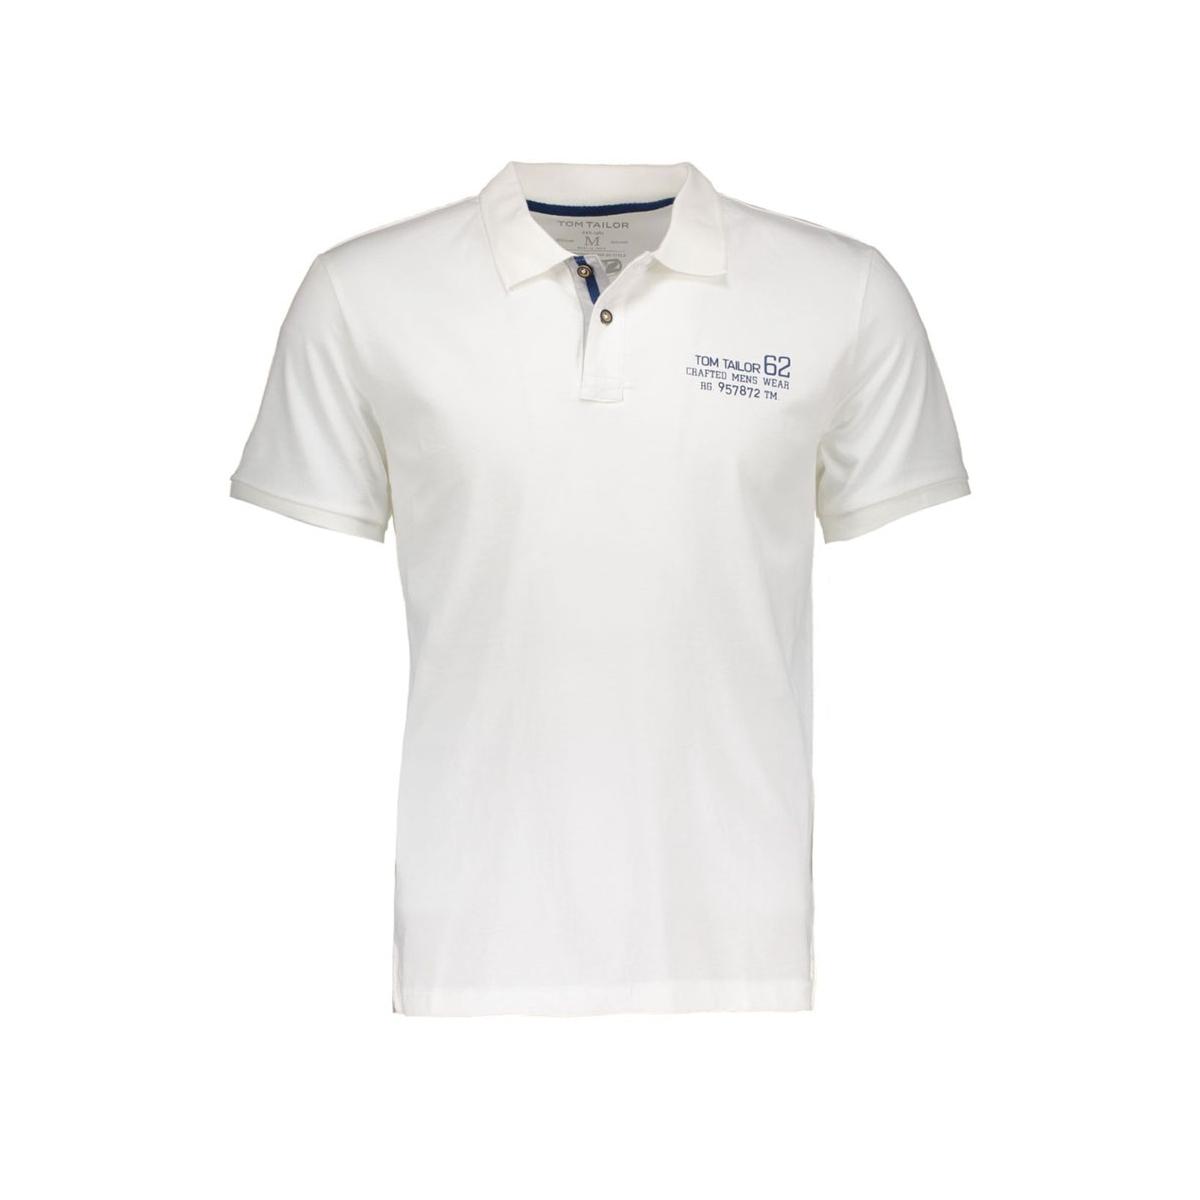 1530910.00.10 tom tailor polo 2000